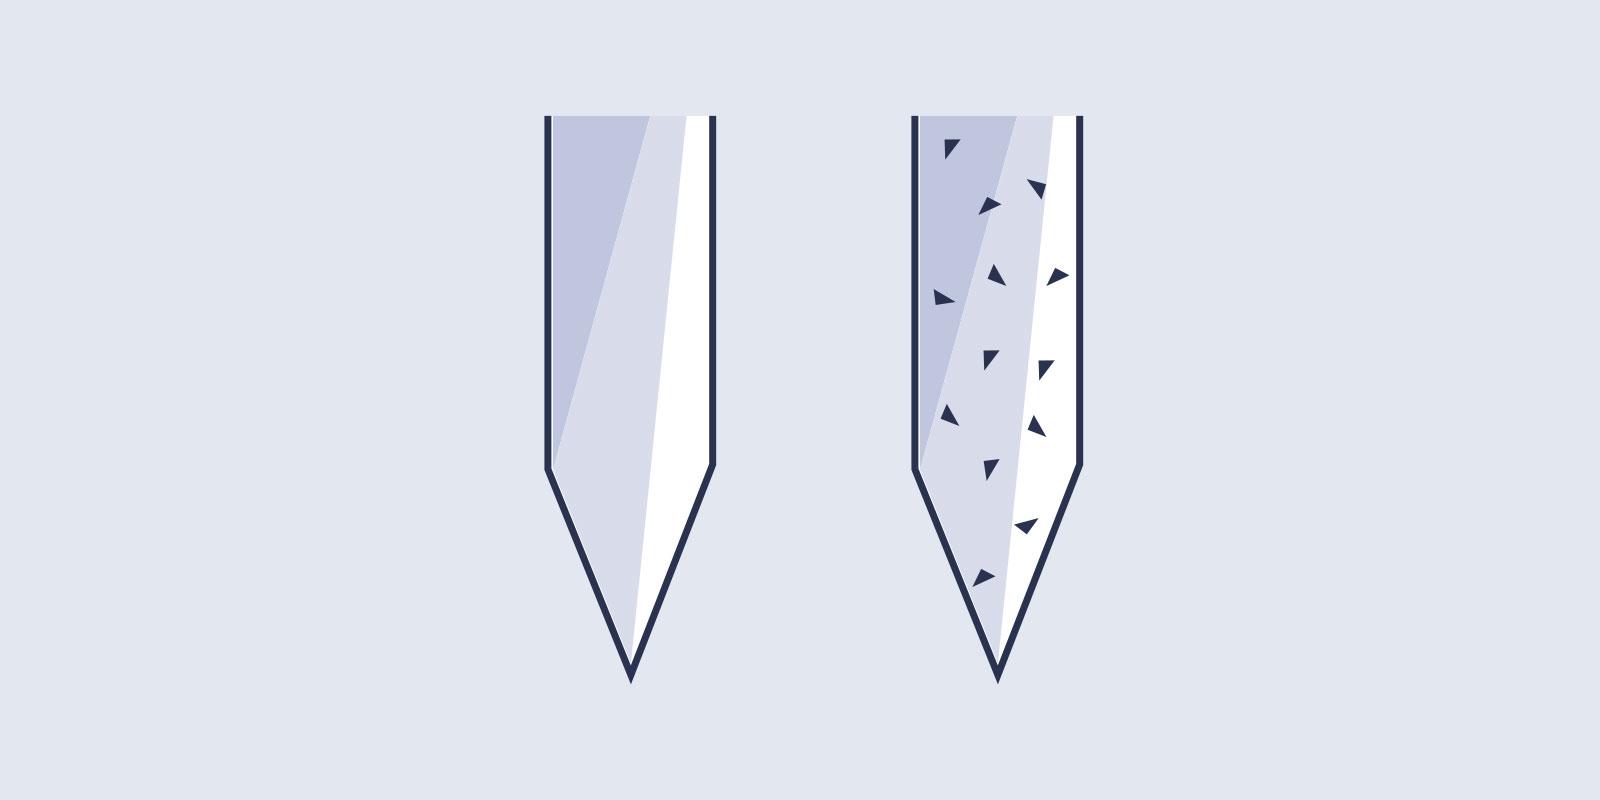 Textured Needles